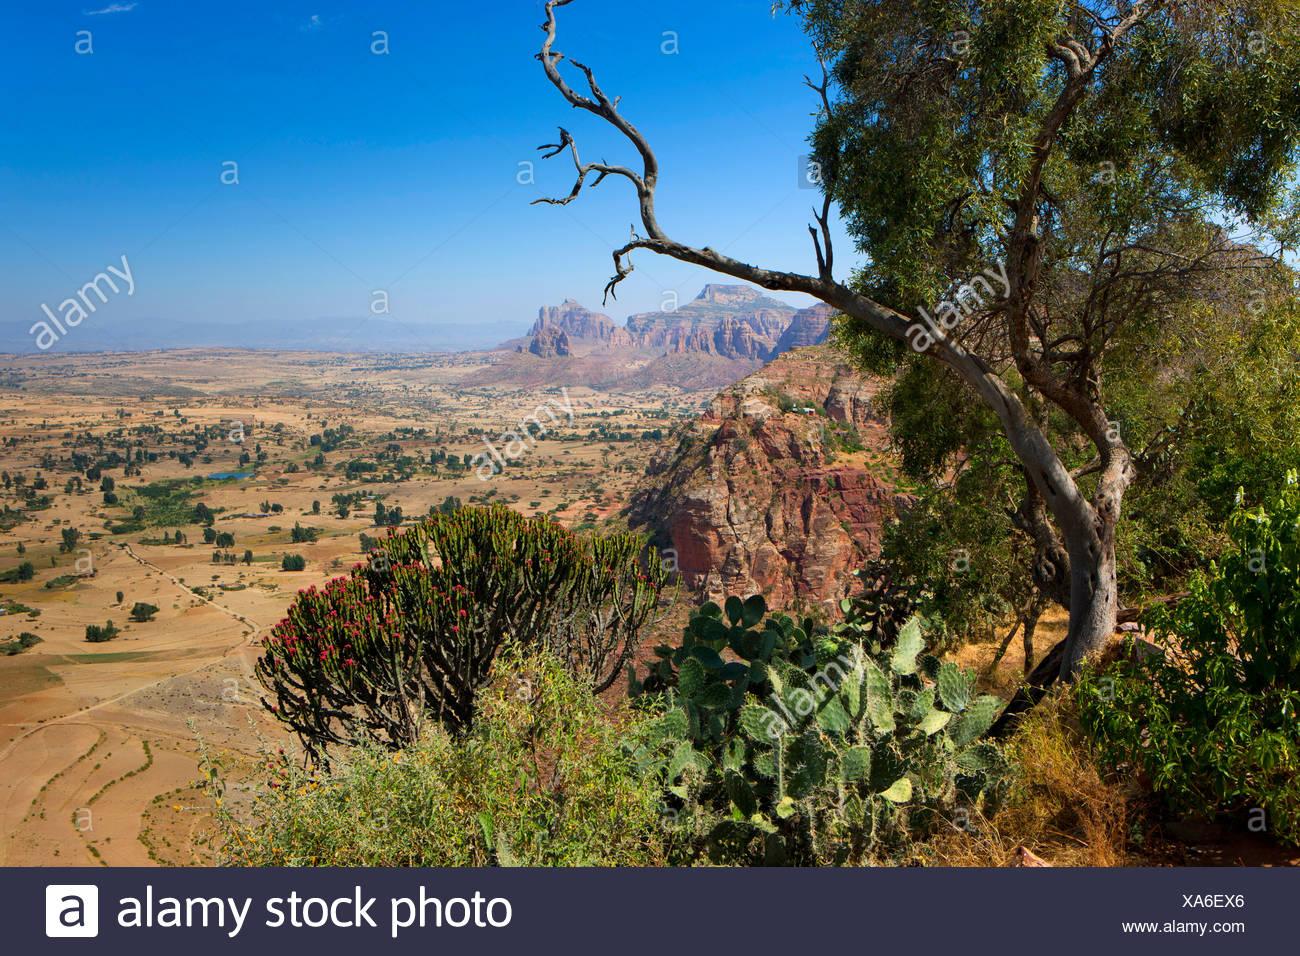 Gerealta, Africa, Ethiopia, highland, view point, tree, cacti - Stock Image